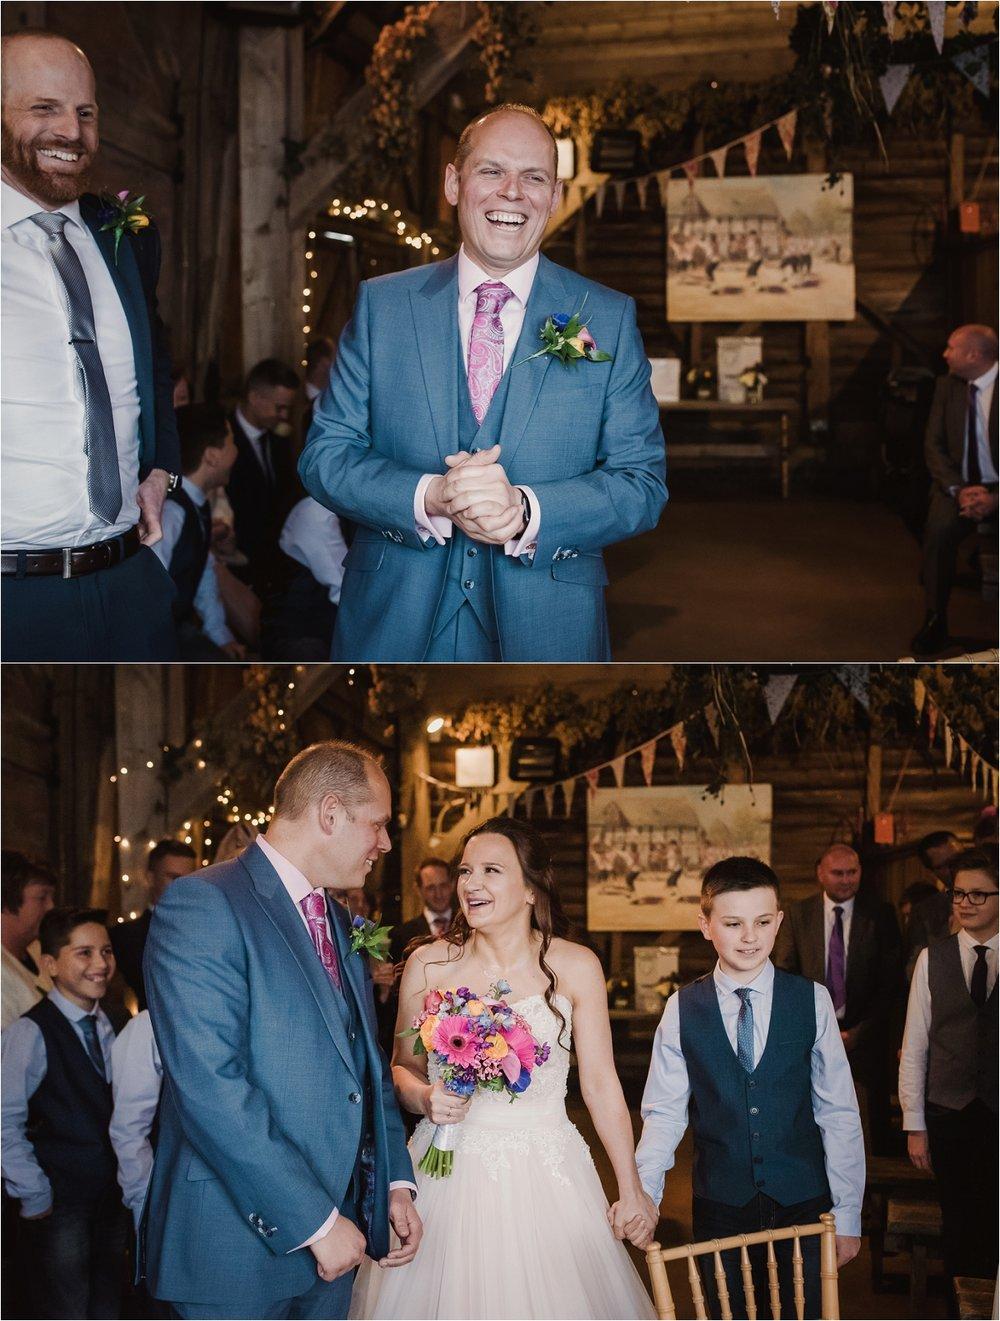 chris_emma_wedding_the_Fleece_inn_0029.jpg